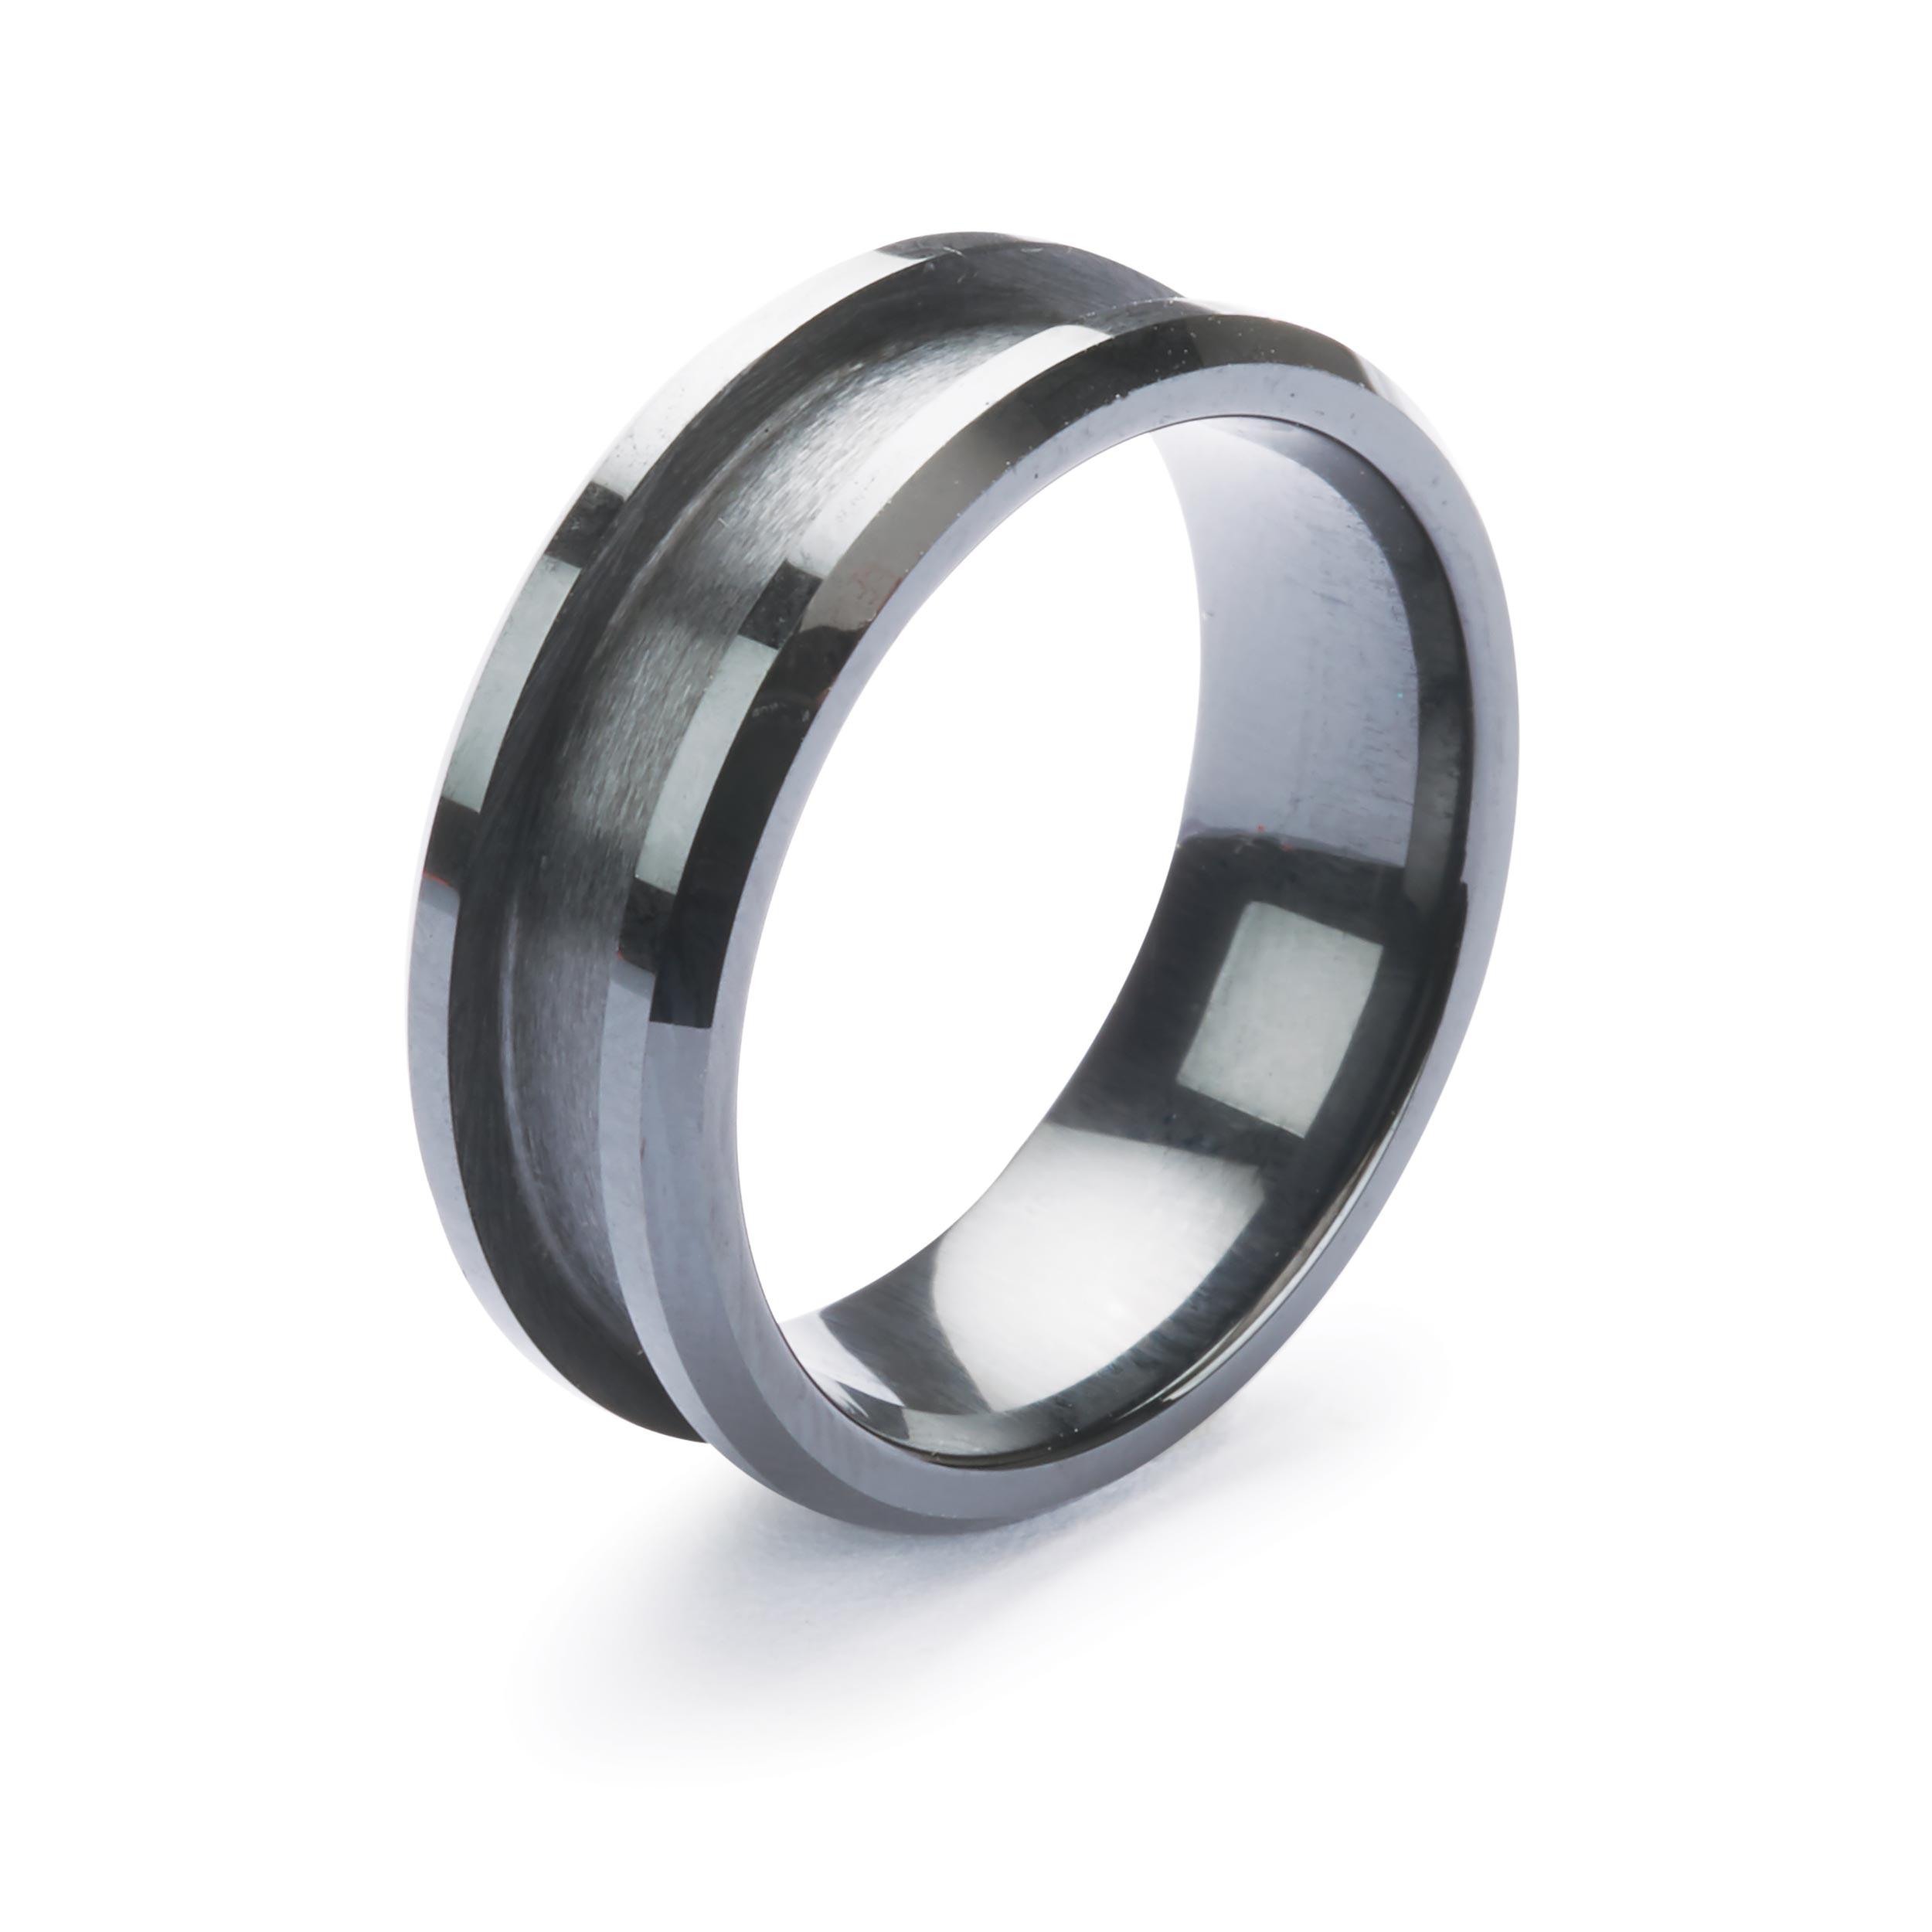 Comfort Ring Core - Black Ceramic - 8mm, Size 9